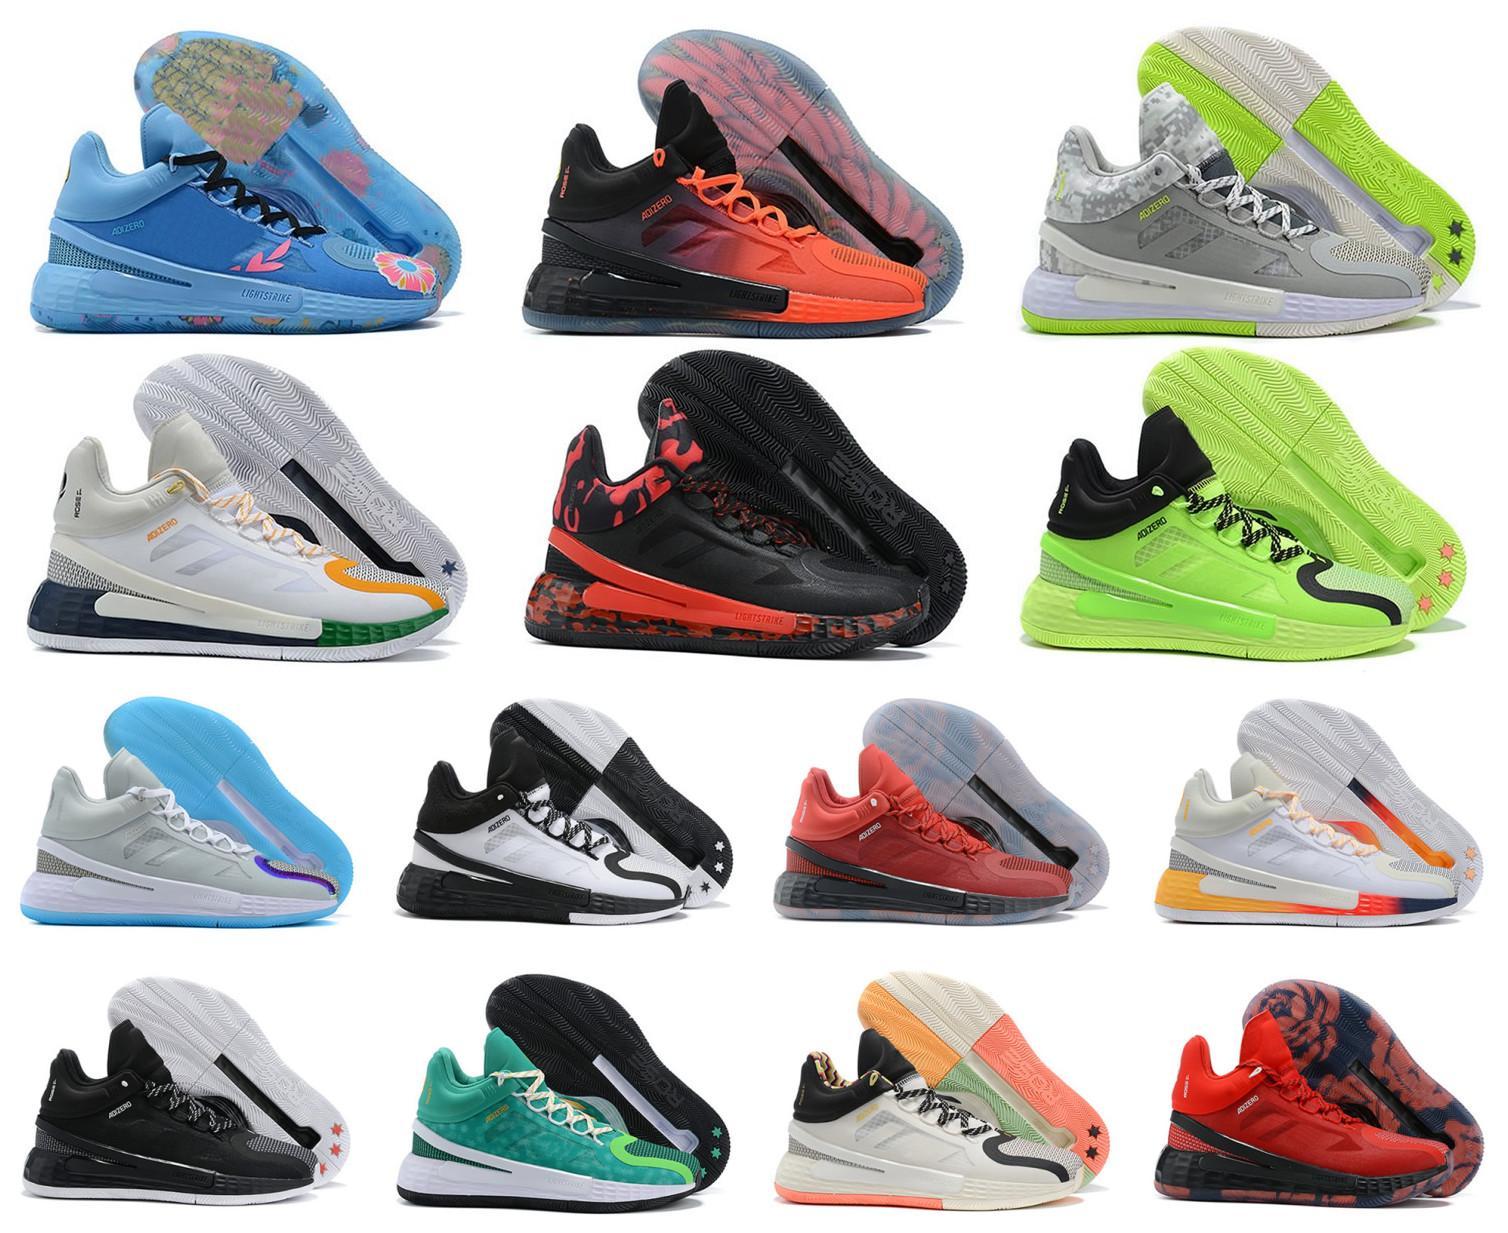 2021 Nouveau D Derrick Rose 11 11S XI MVP 11ème Hommes Basketball Chaussures Hommes Top Qualité Chaussures Sports Sneakers Chaussures Taille 40-46